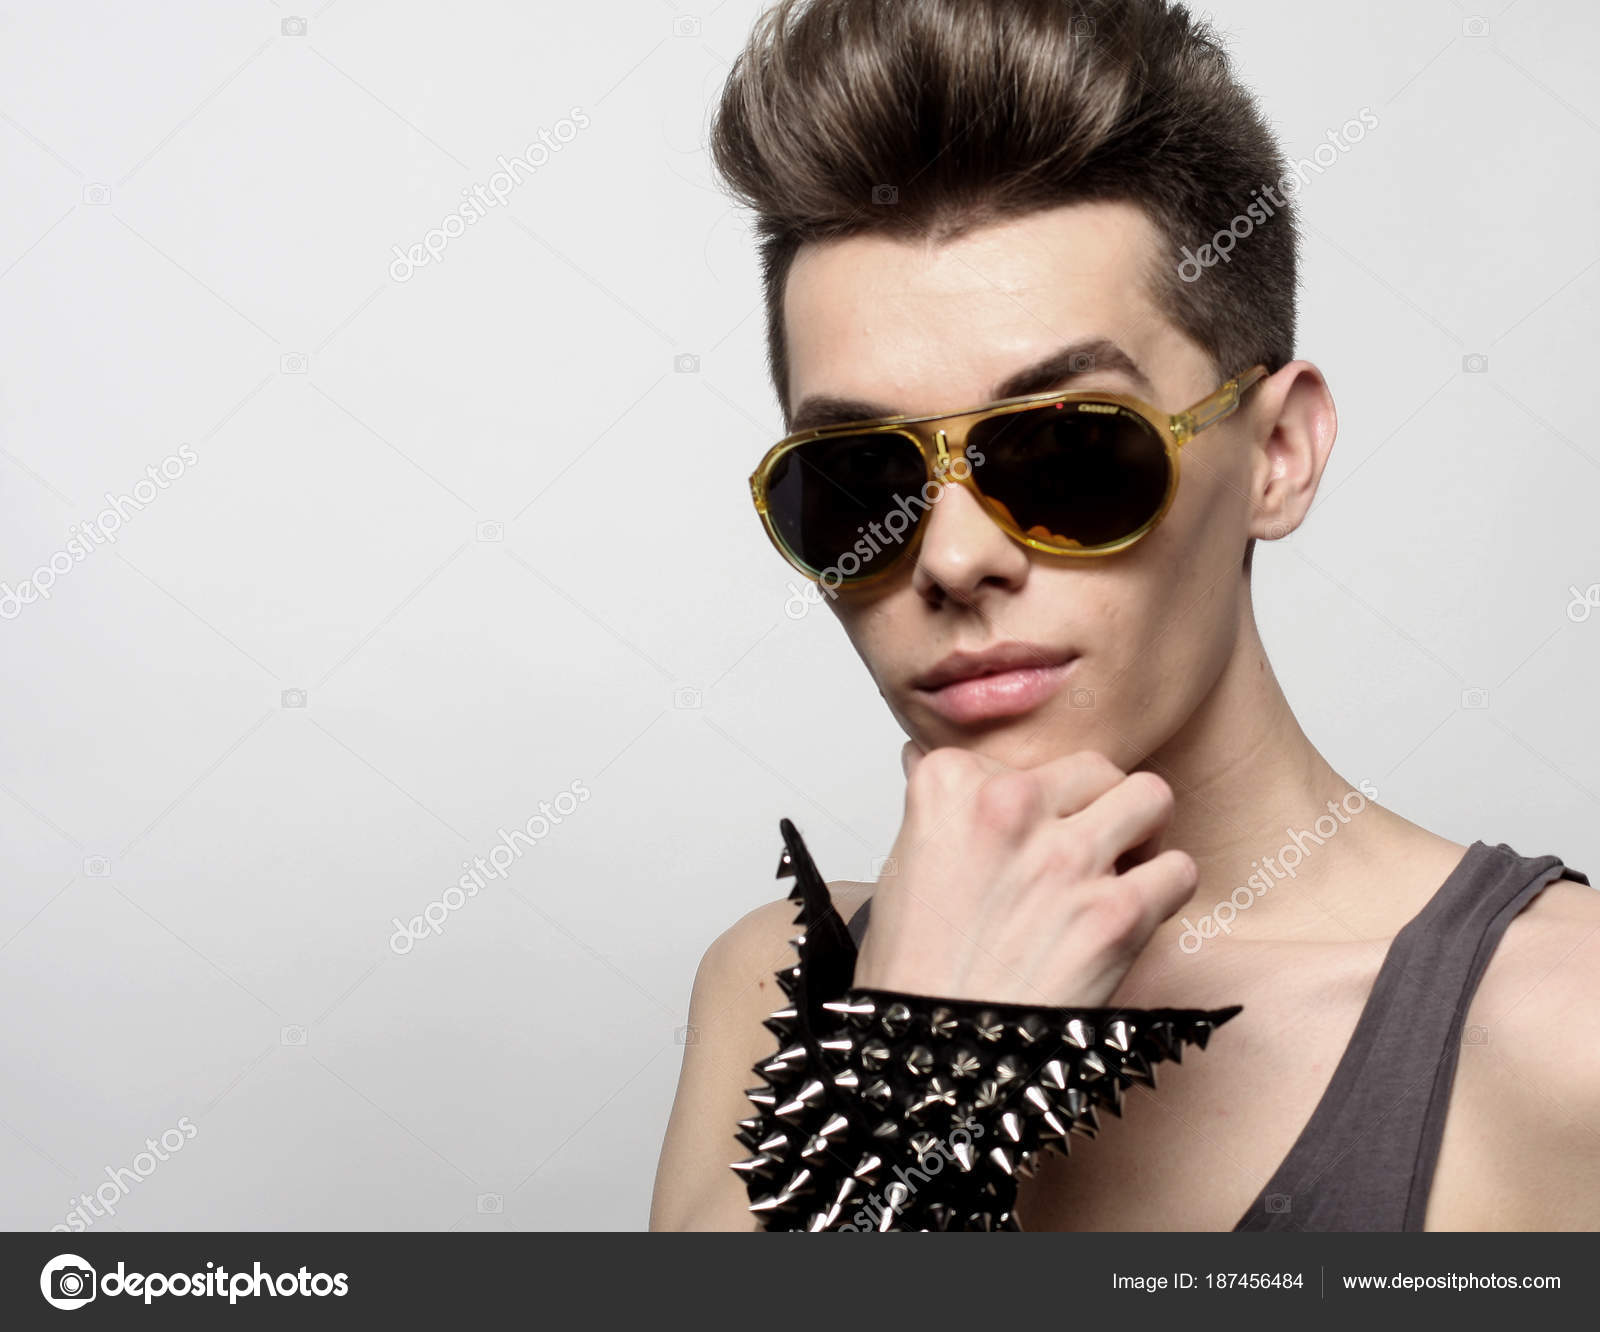 Сексуальна молода людина в моду стиль 9b0ba7db75179